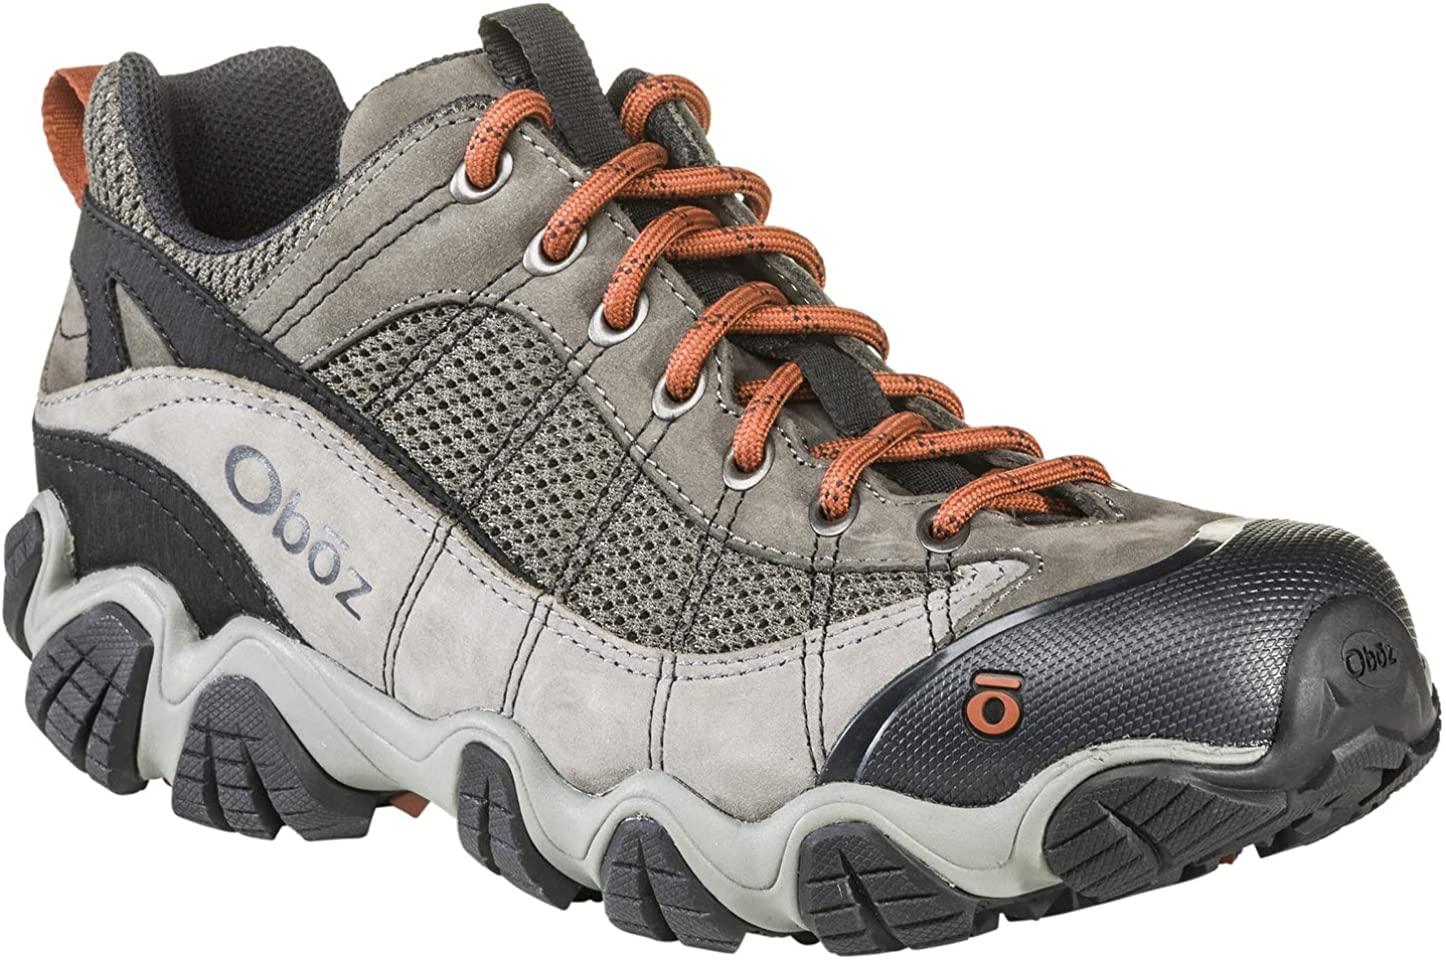 Oboz Mens Firebrand II Low Hiking Shoe